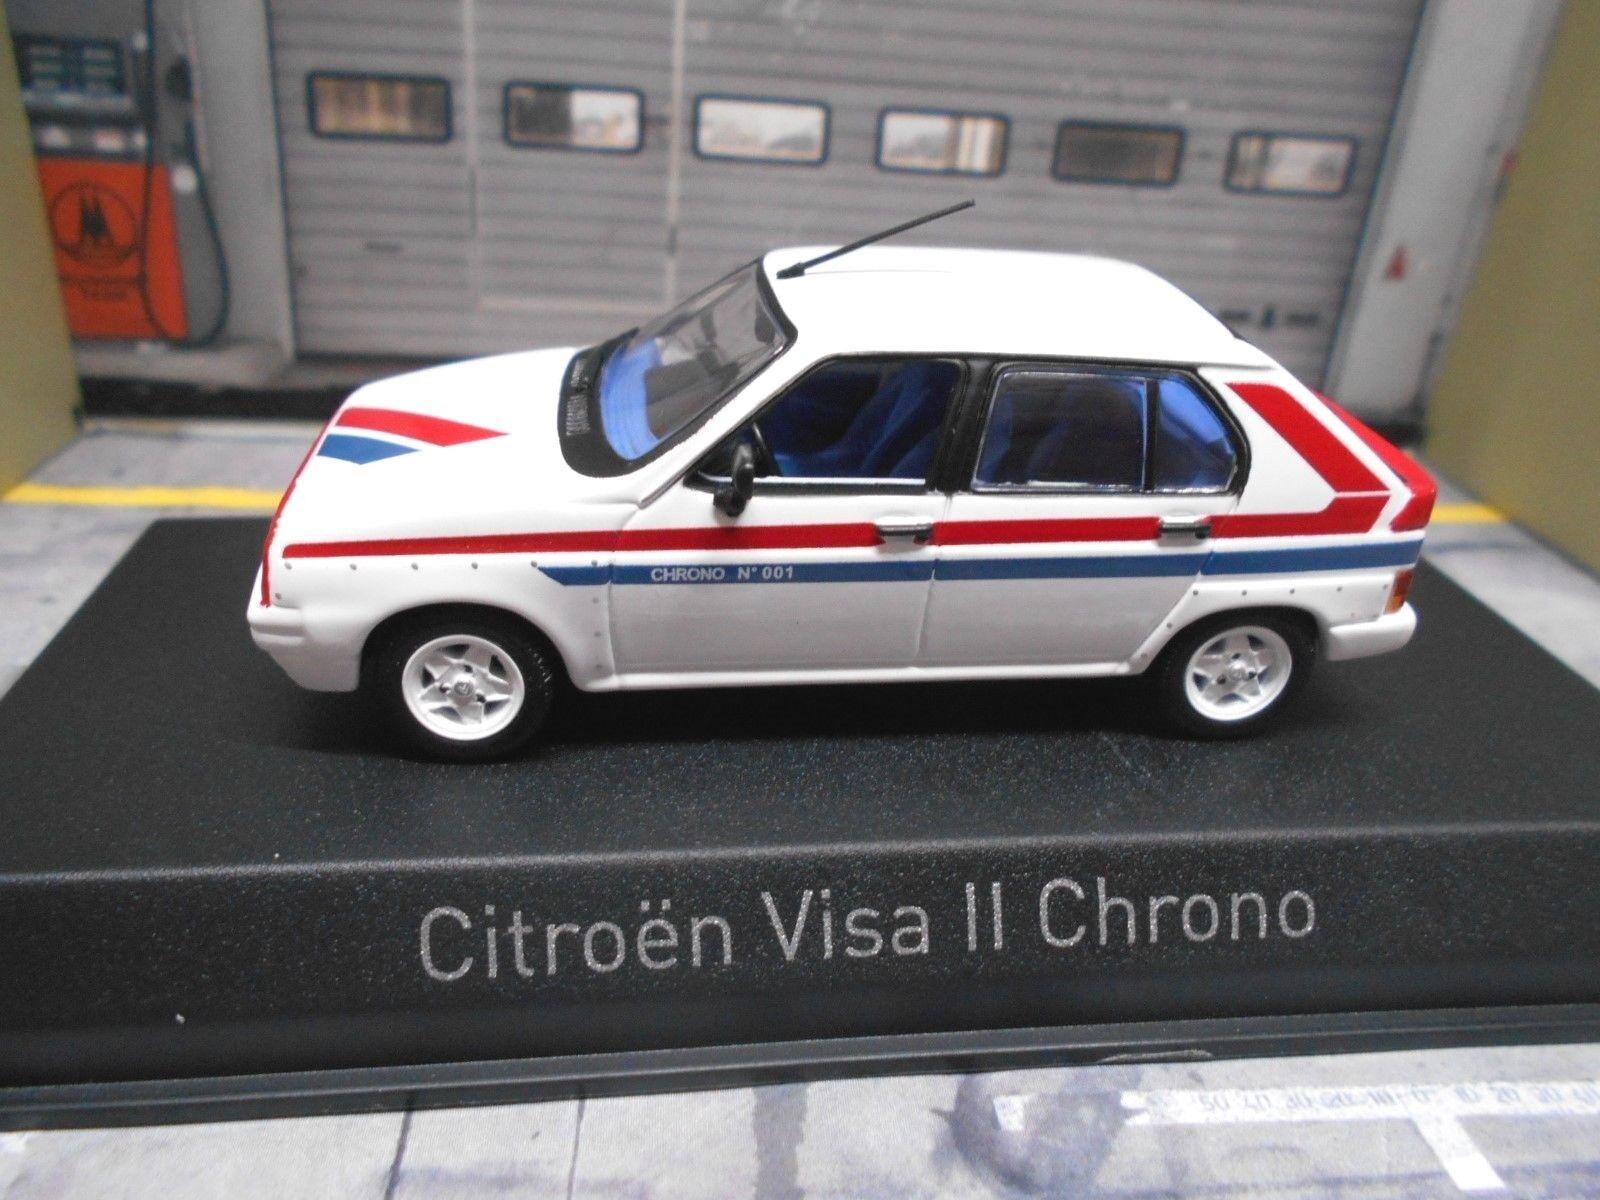 CITROEN VISA II 2 chrono 4x4 1982 Blanc blanc NOREV 1 43